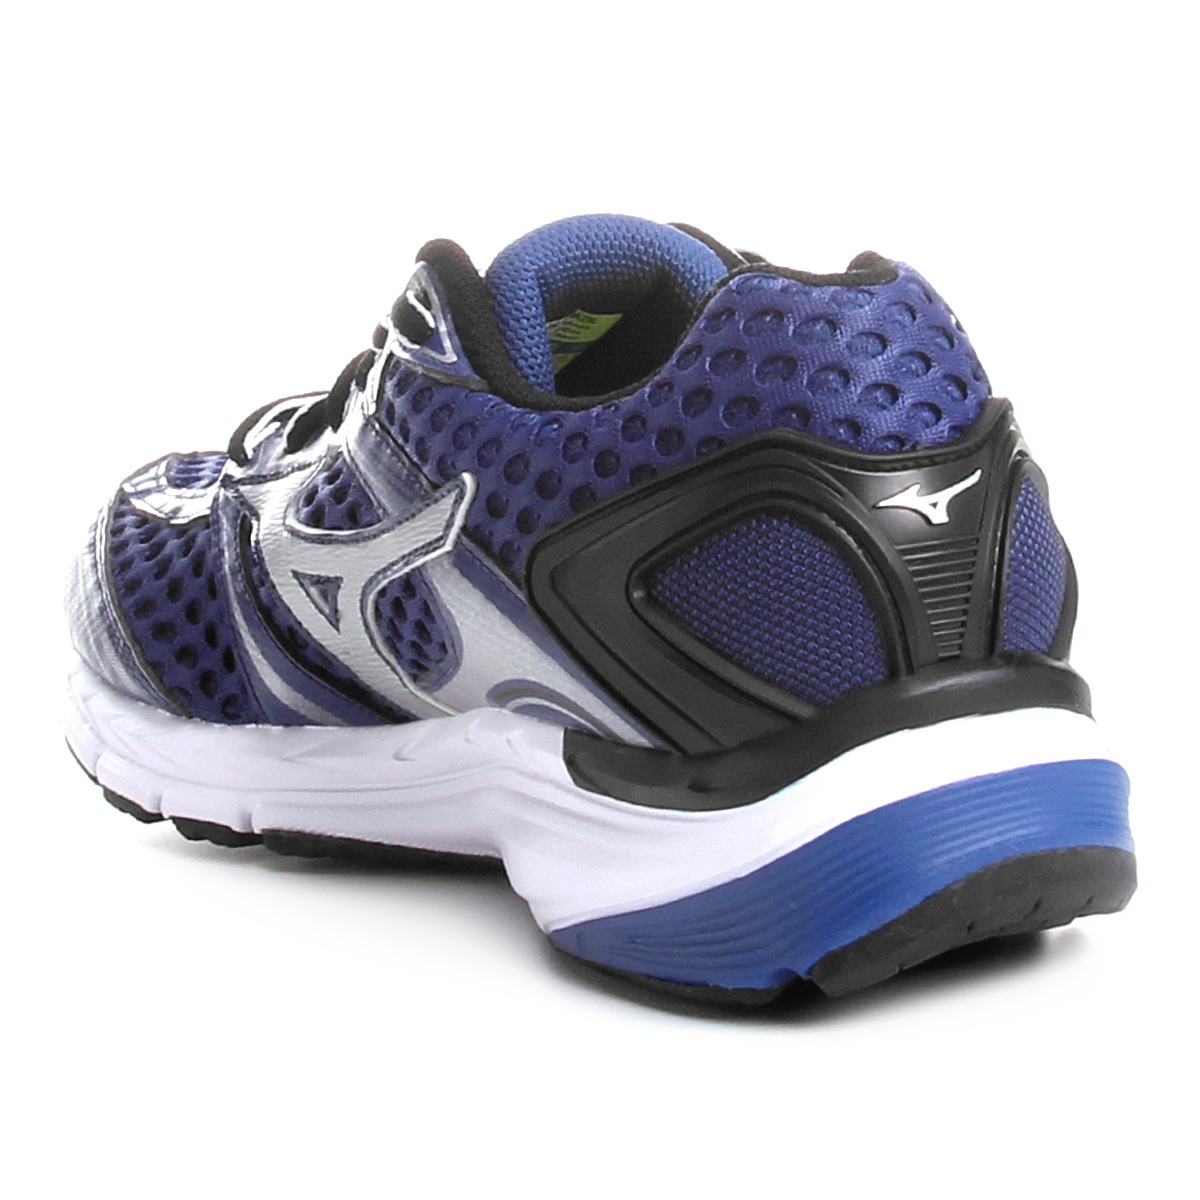 tênis mizuno iron 2 azul prata masculino. Carregando zoom. 58ee1e6594dd9